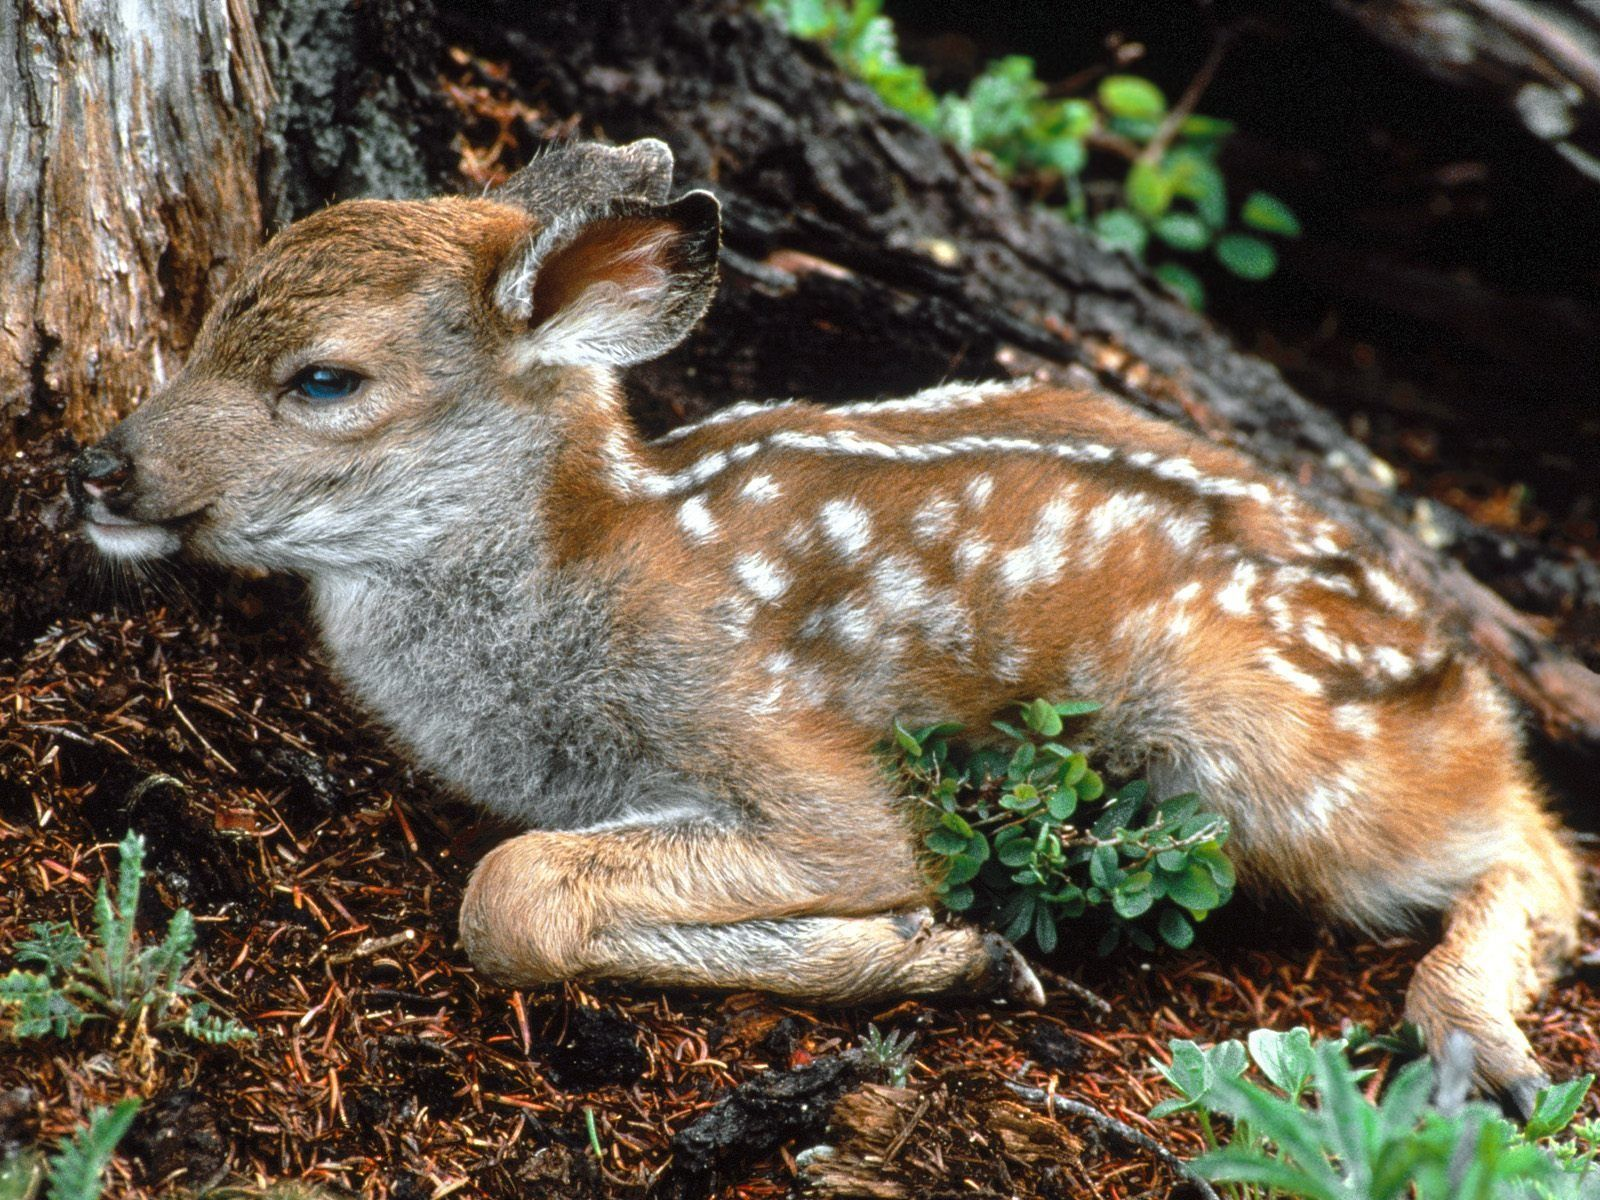 Cute Baby Animal Wallpapers Wallpaper